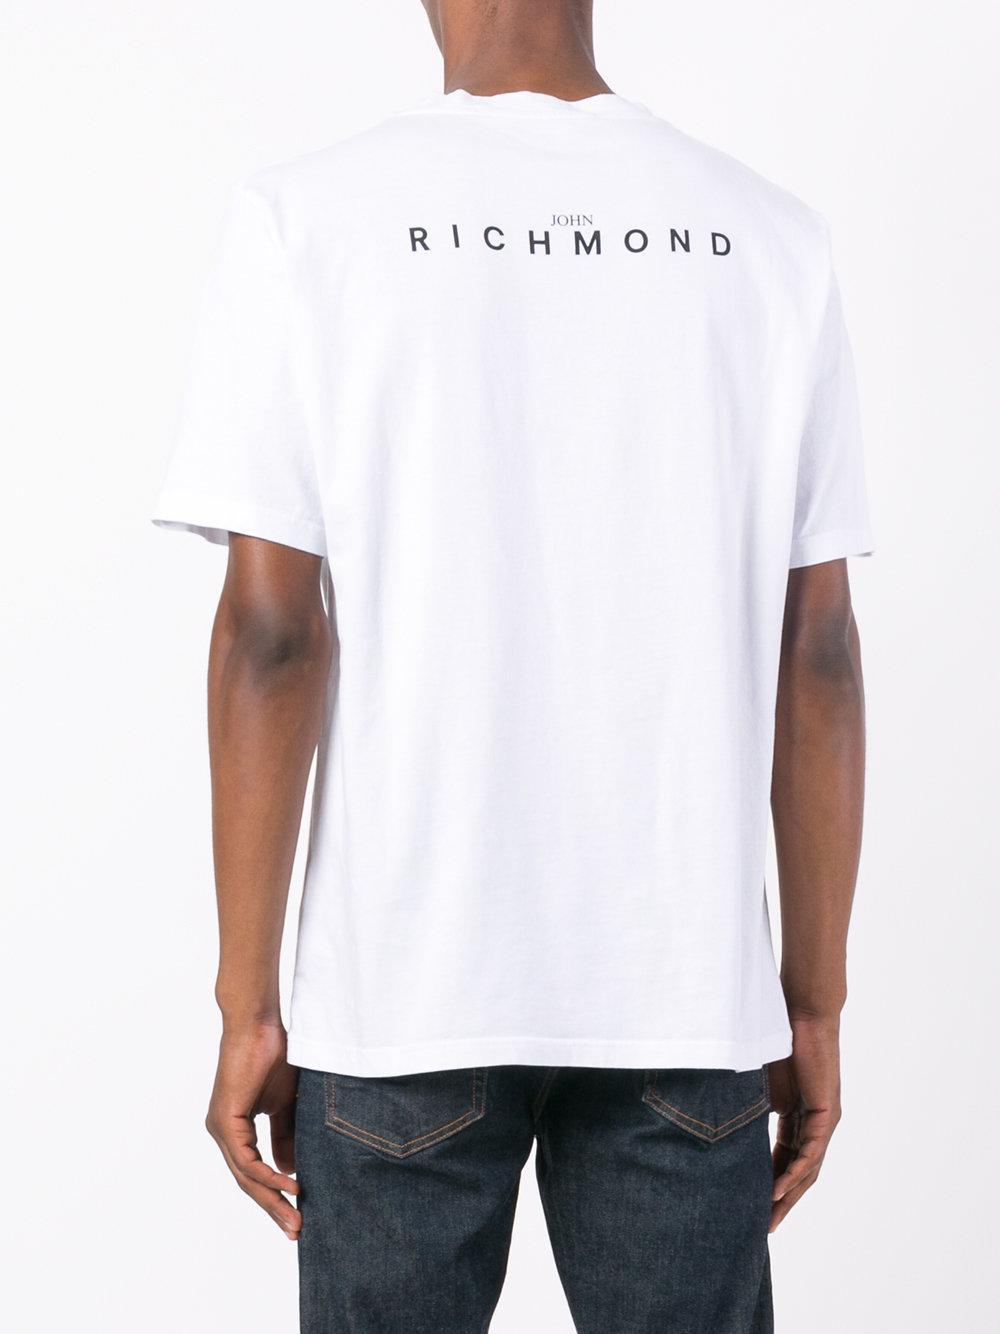 John richmond refind print t shirt in white for men lyst for Richmond t shirt printing